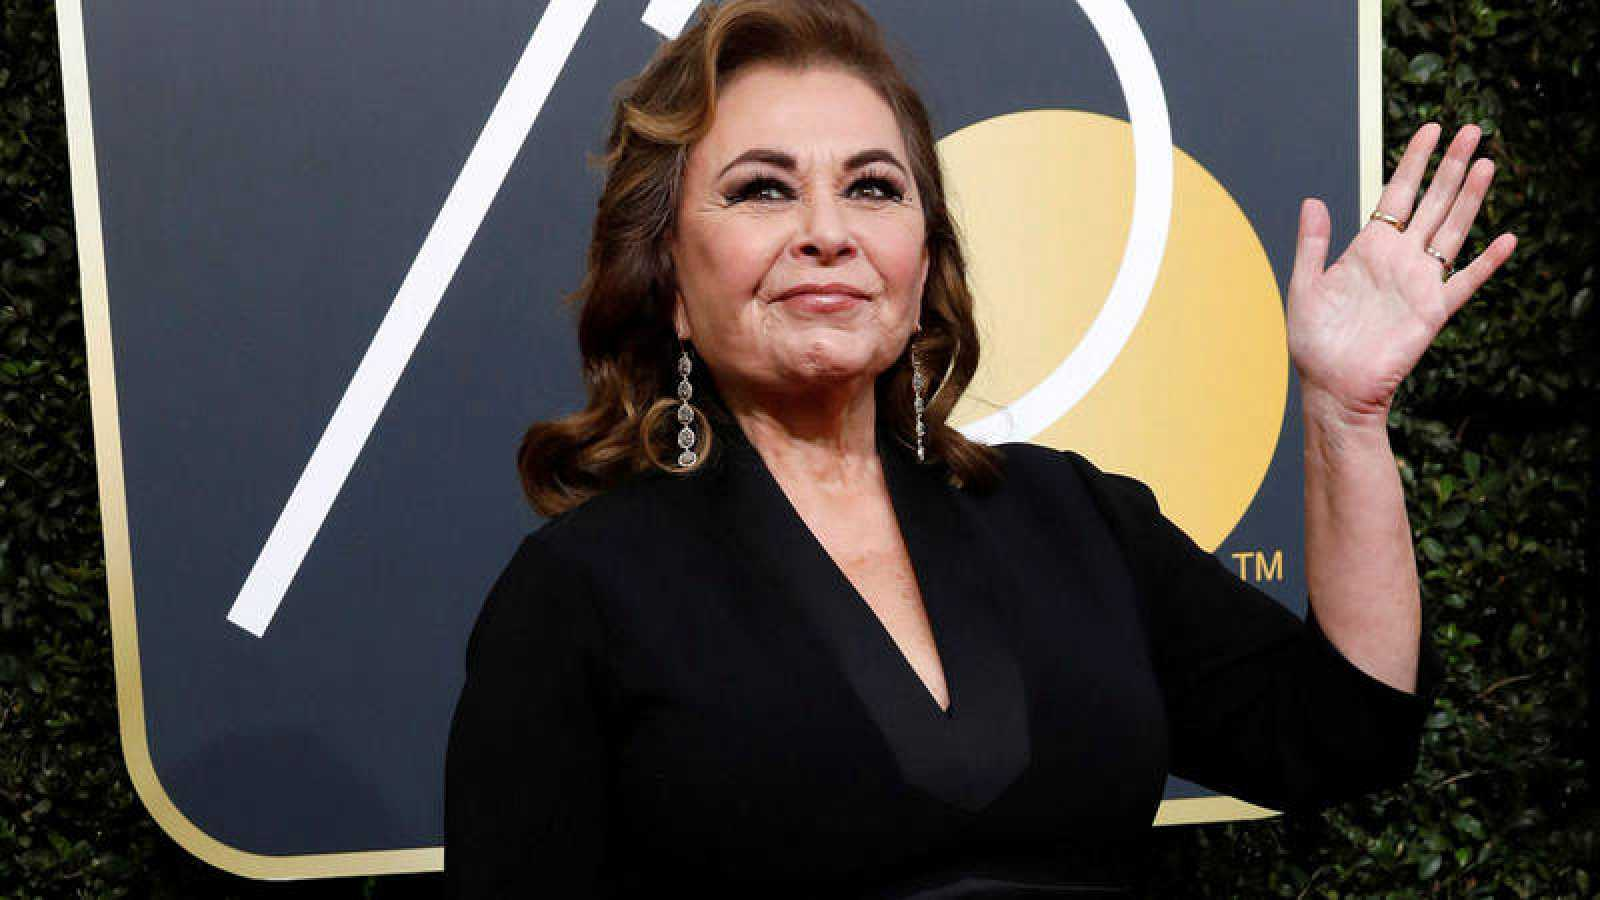 VÍDEO: Se ha cancelado la serie 'Roseanne' de ABC